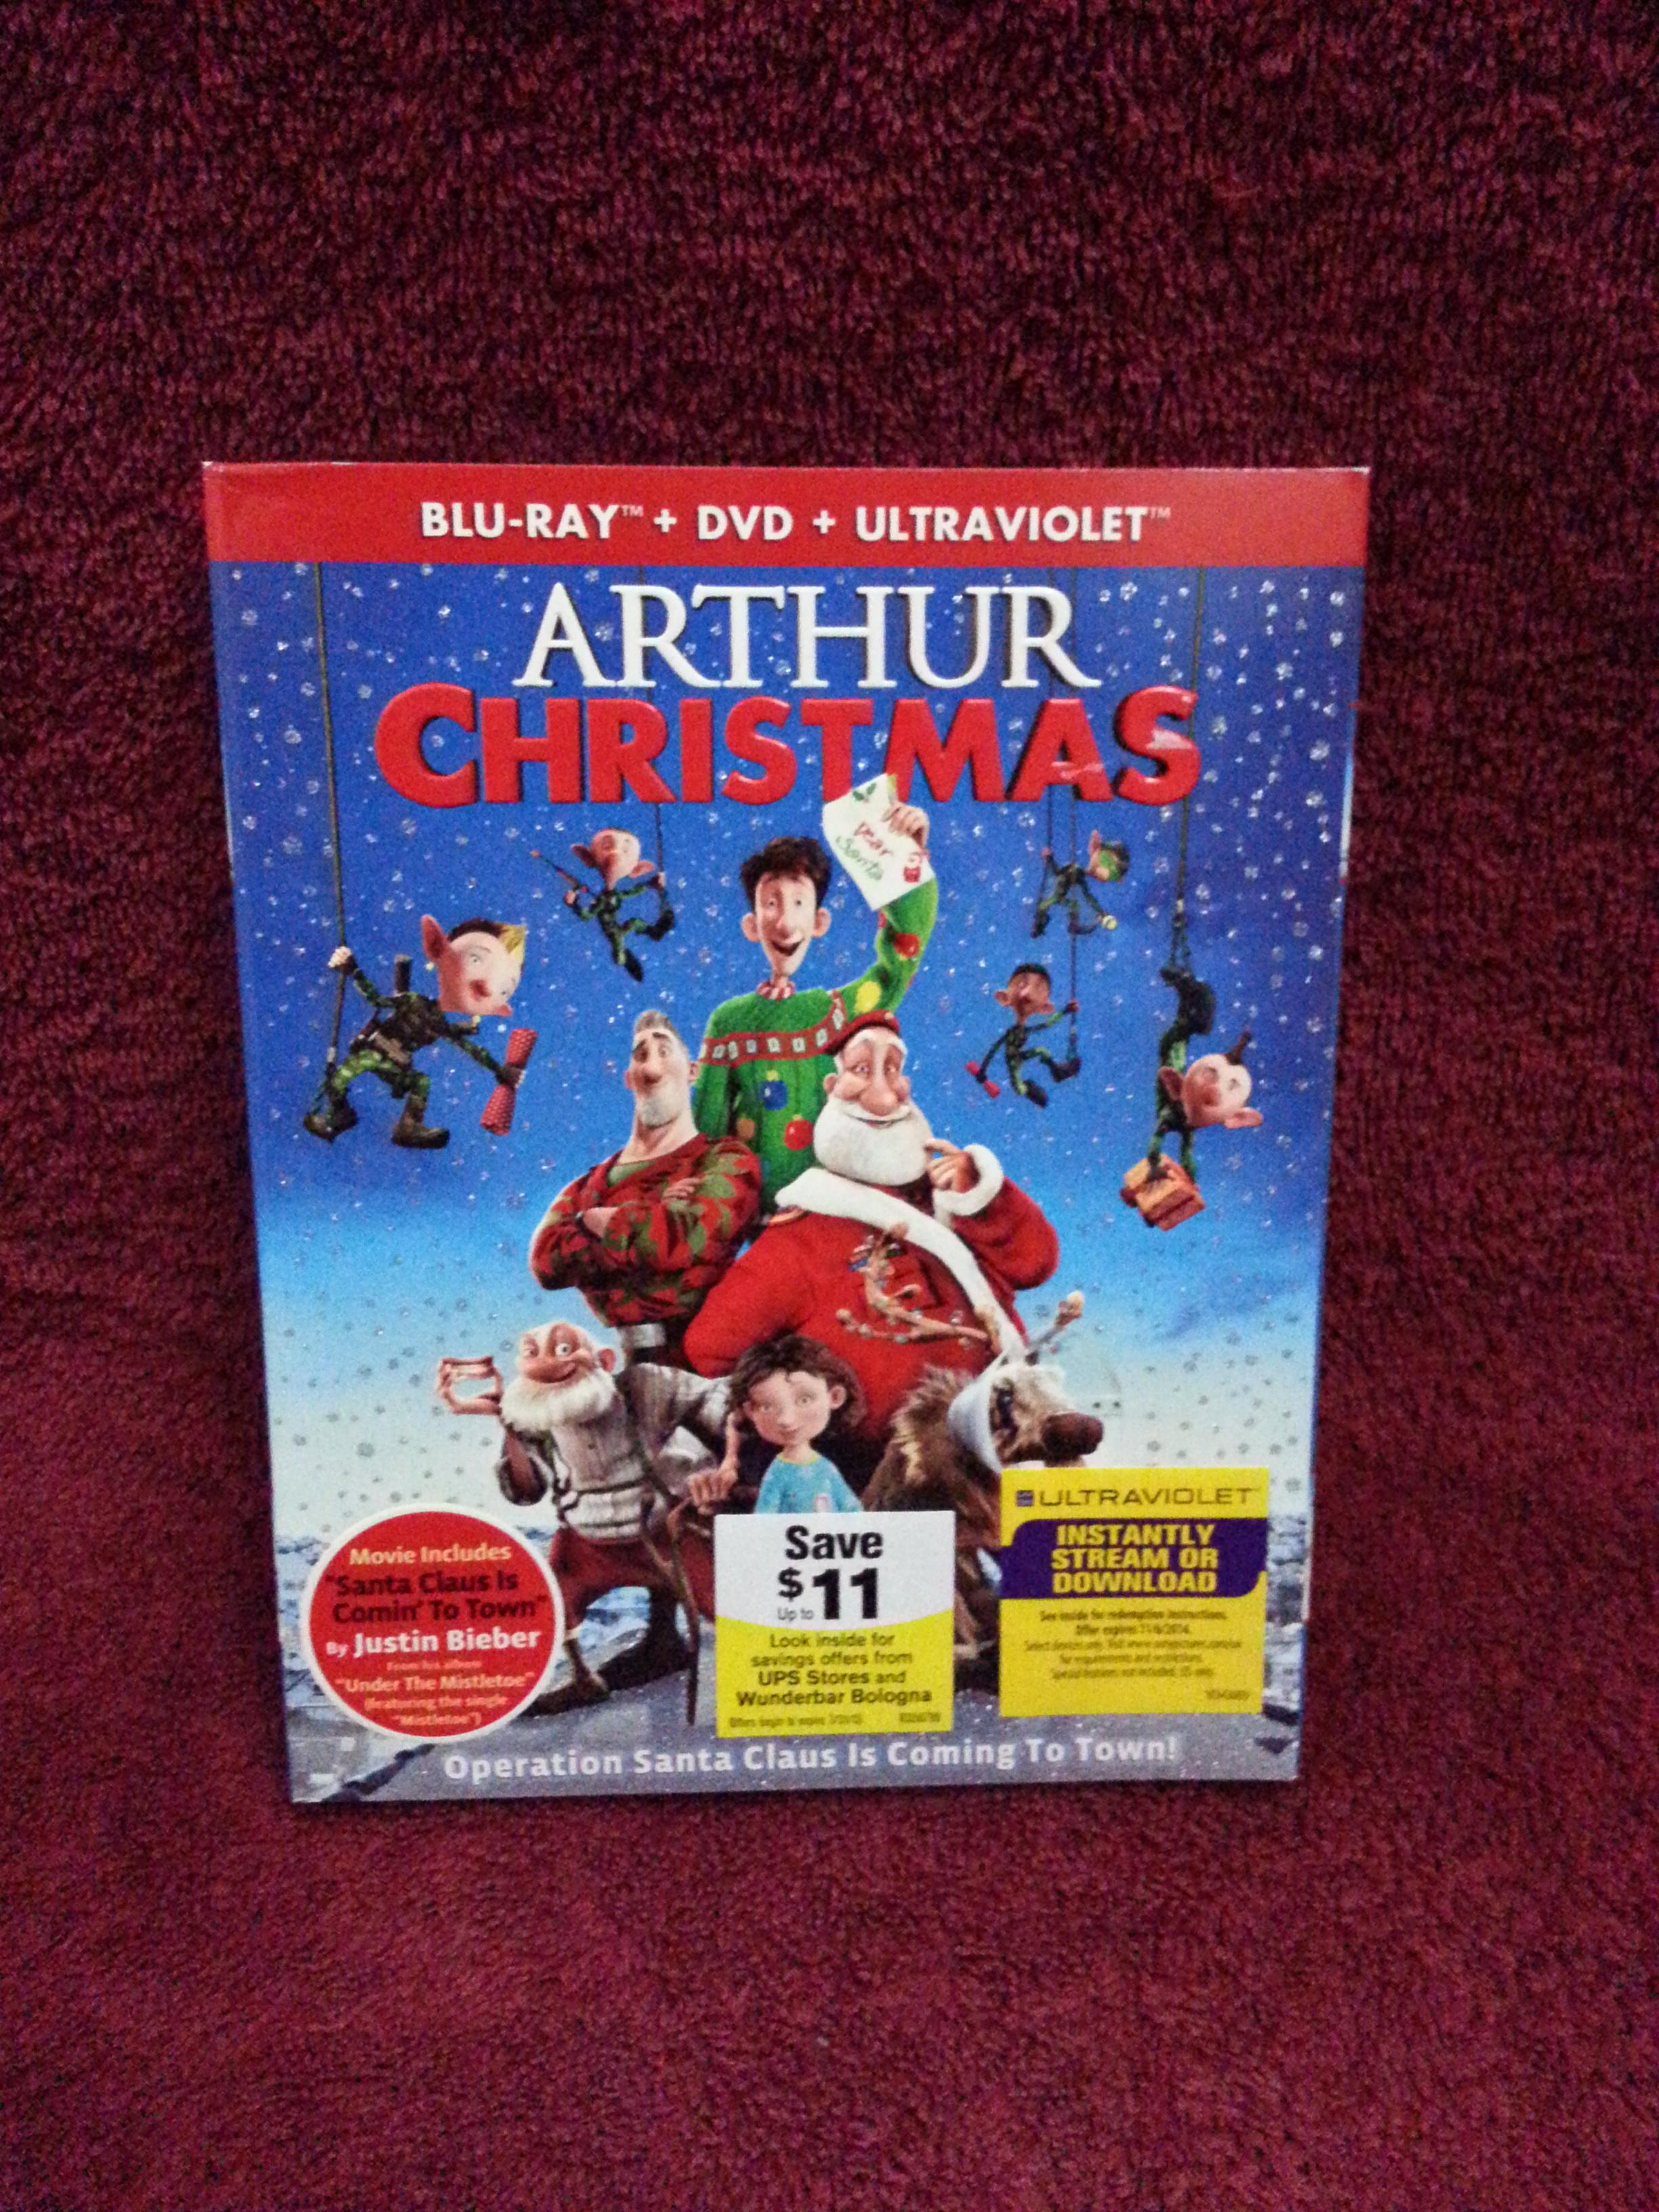 arthur christmas blu ray - Arthur Christmas Dvd